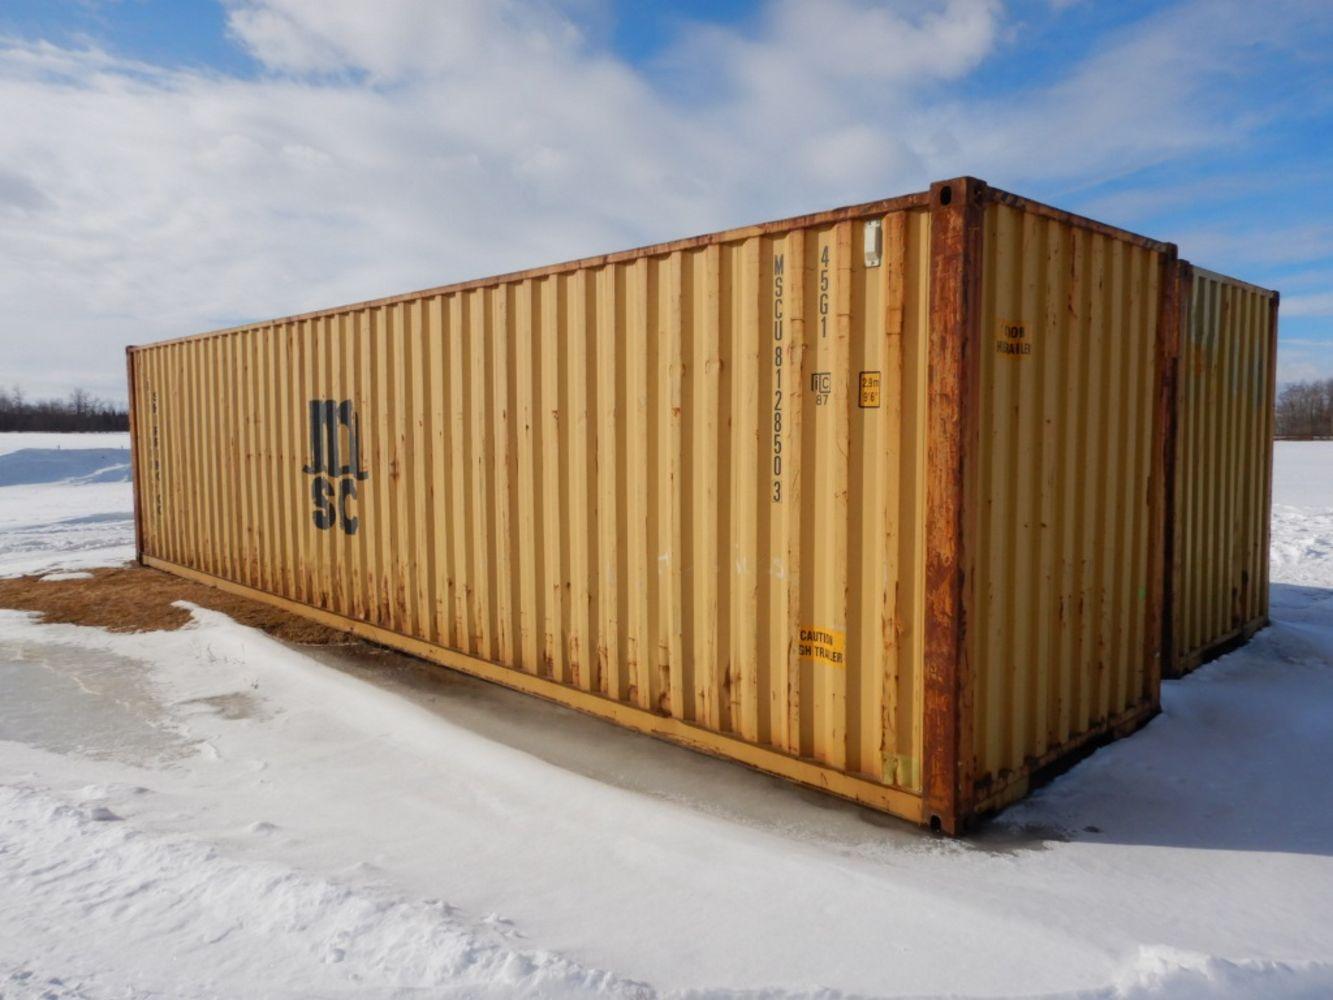 Garden Décor, Stock Panels, Lumber, Electrical Company Dispersal, Vehicles